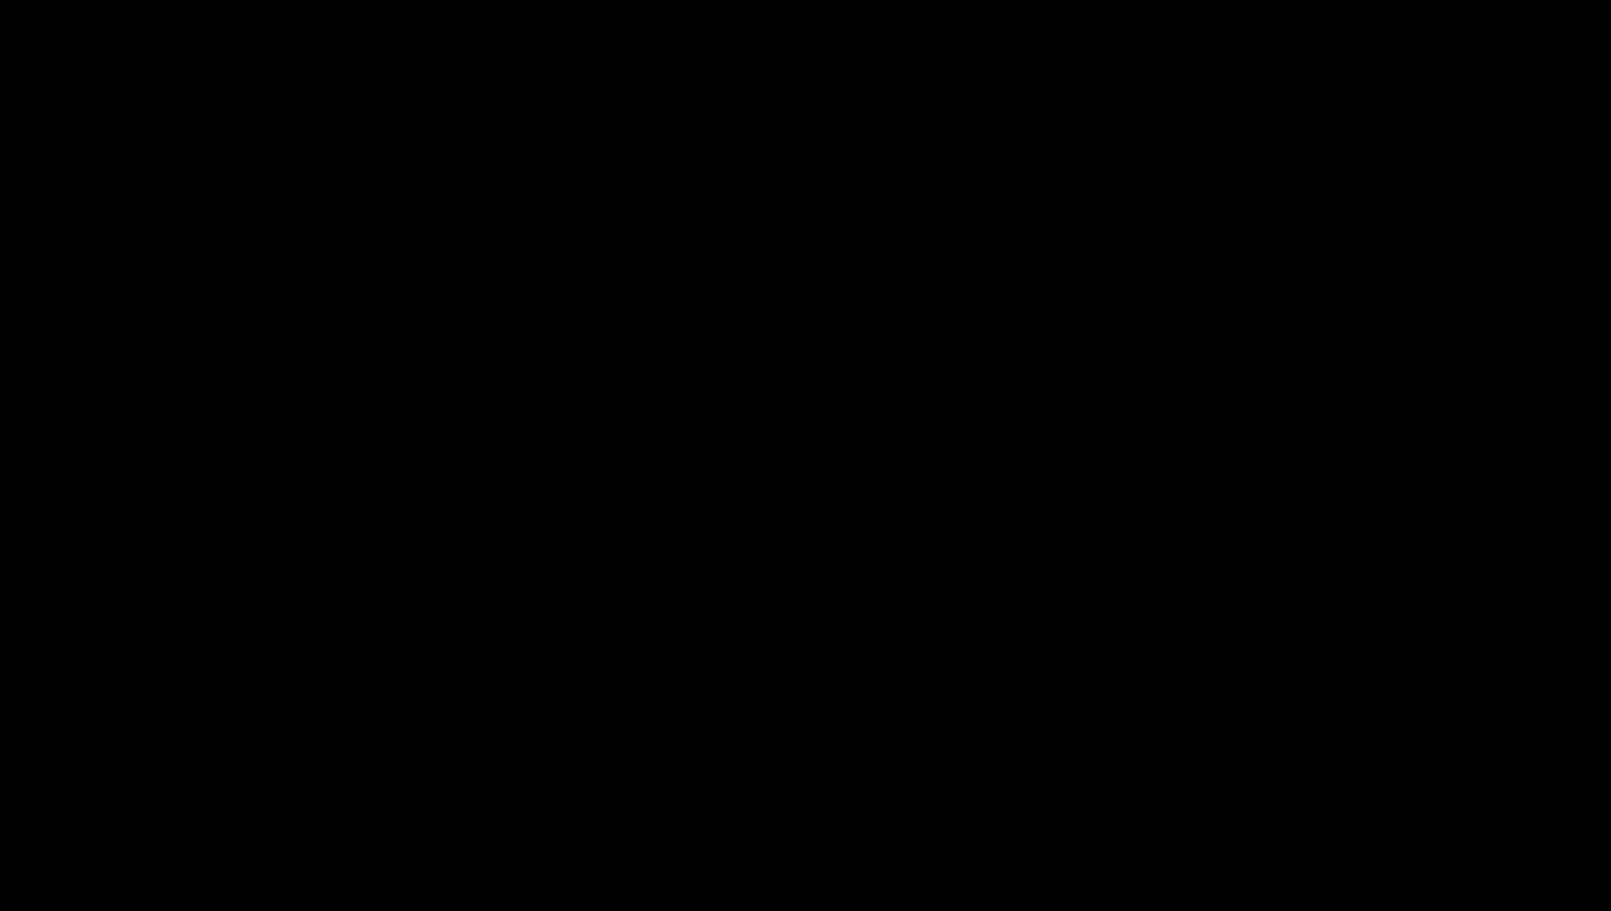 imag6828